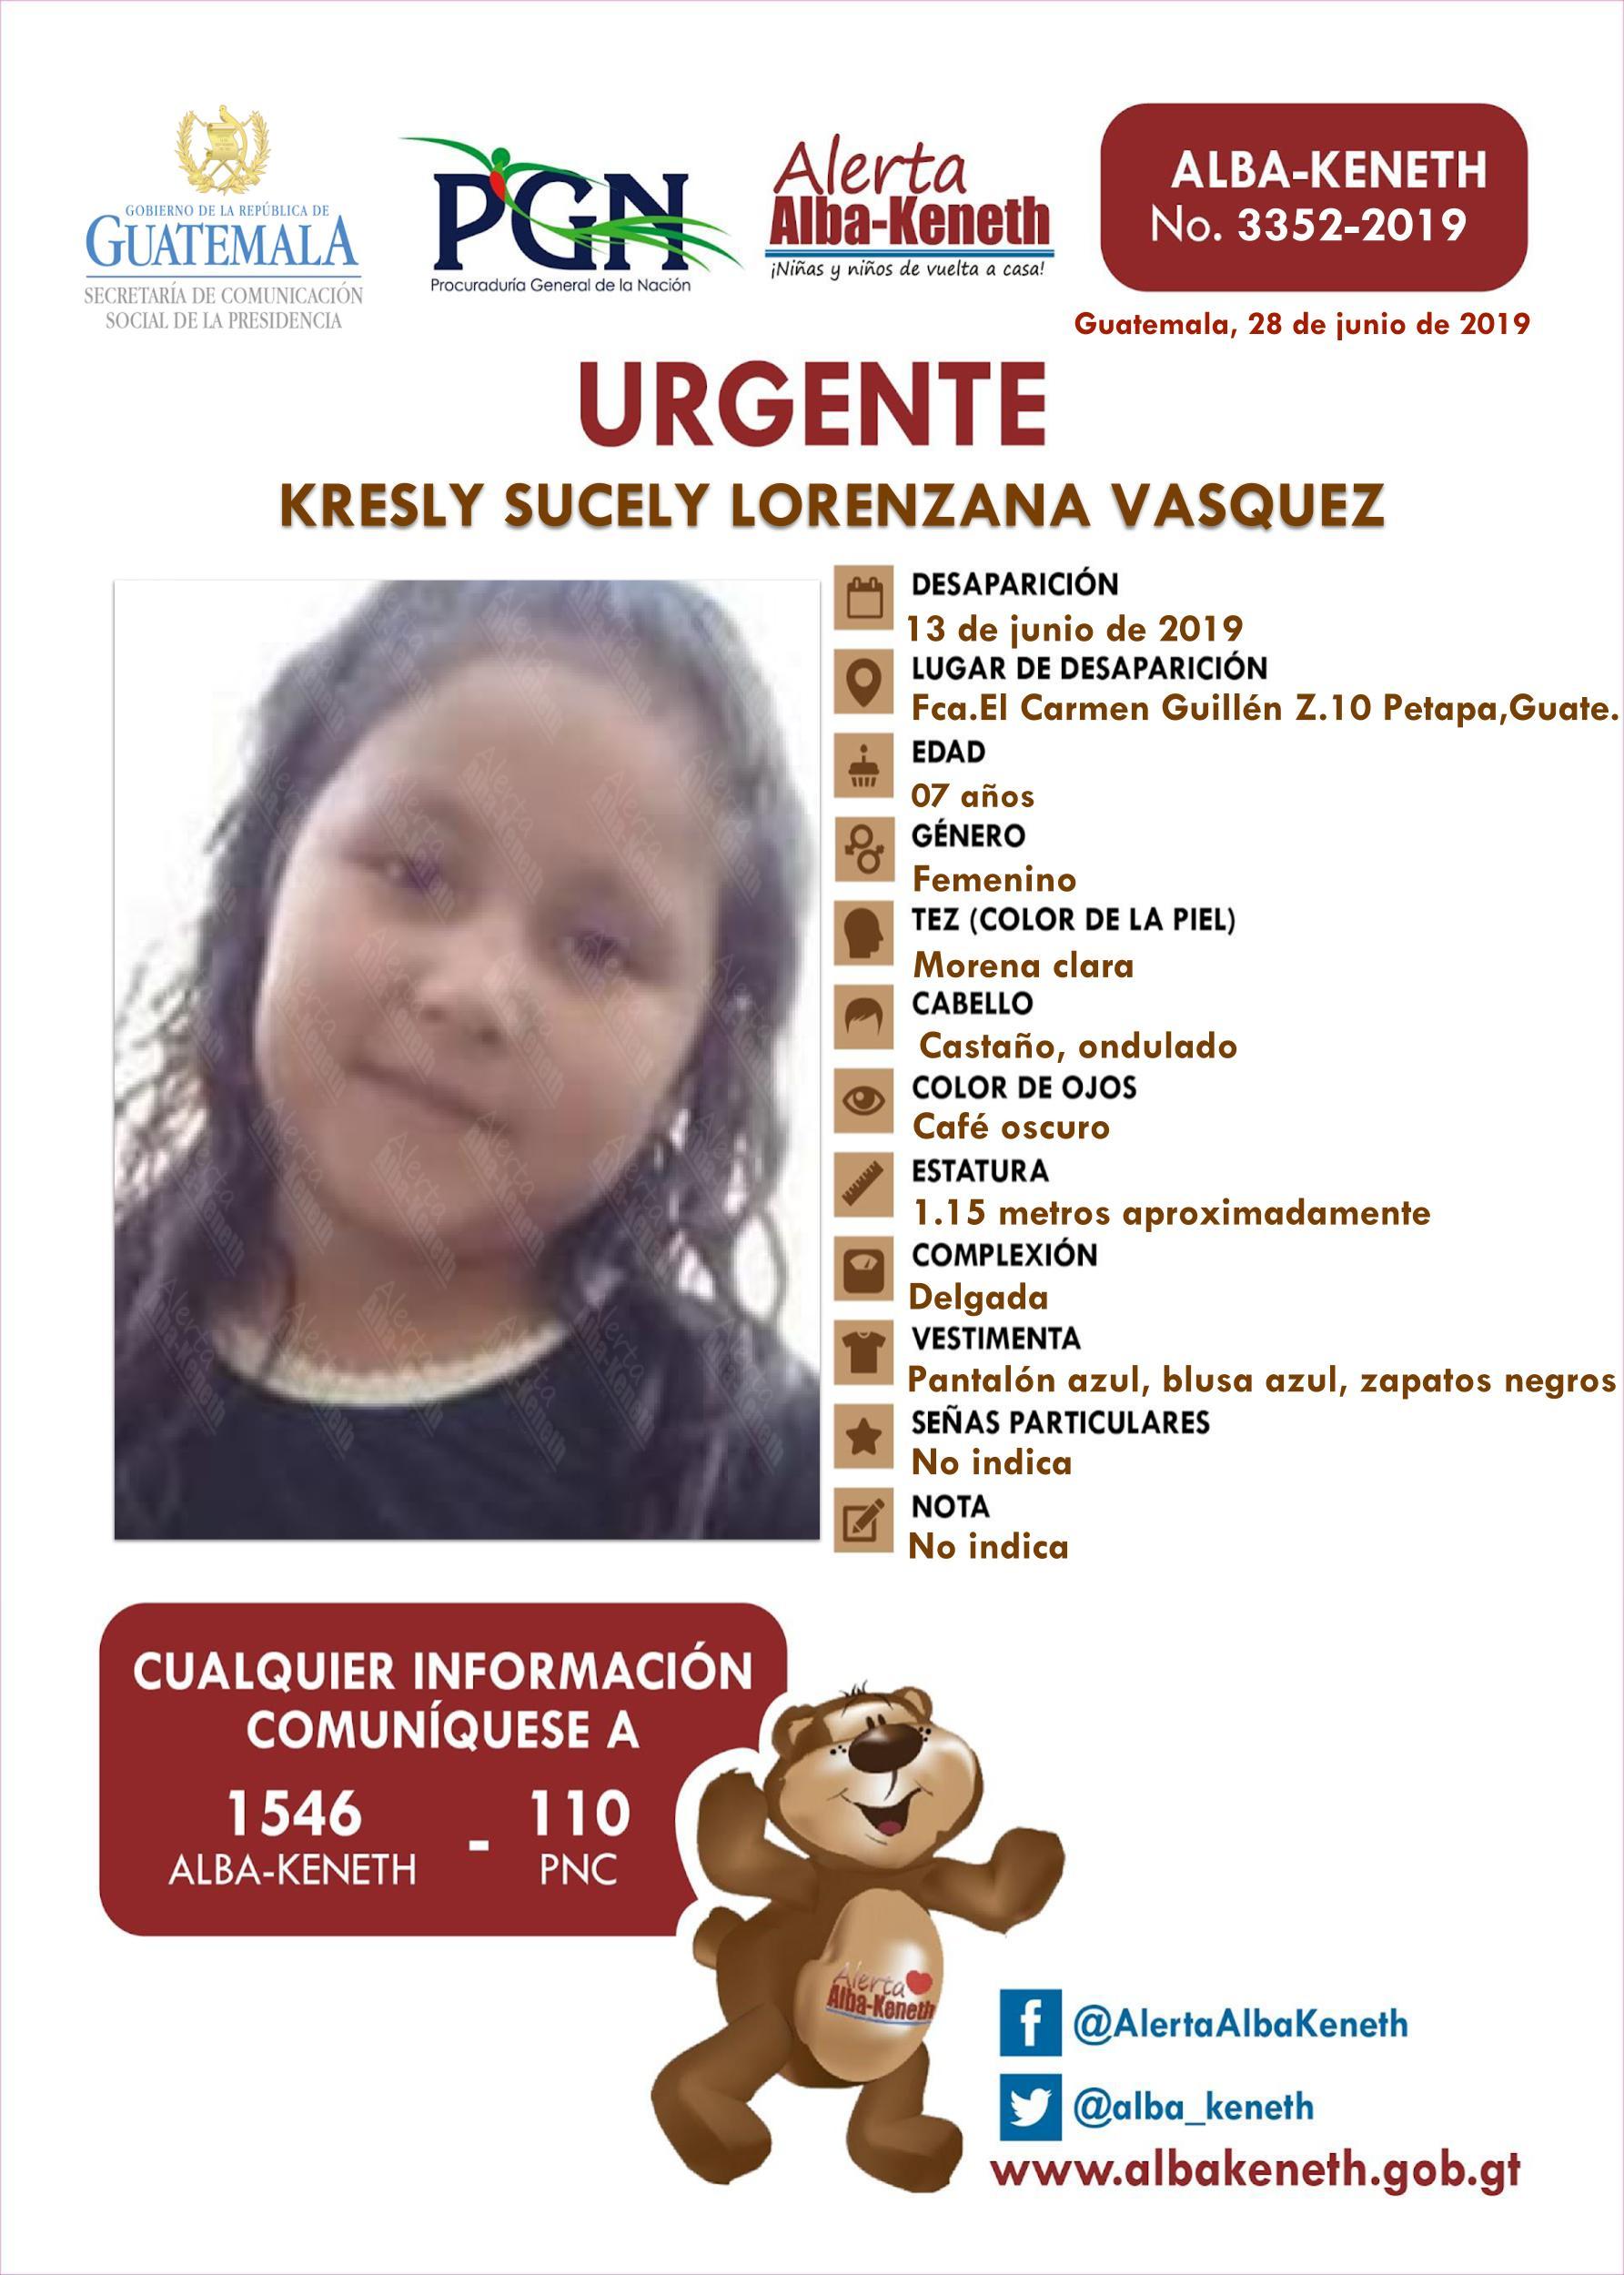 Kresly Sucely Lorenzana Vasquez